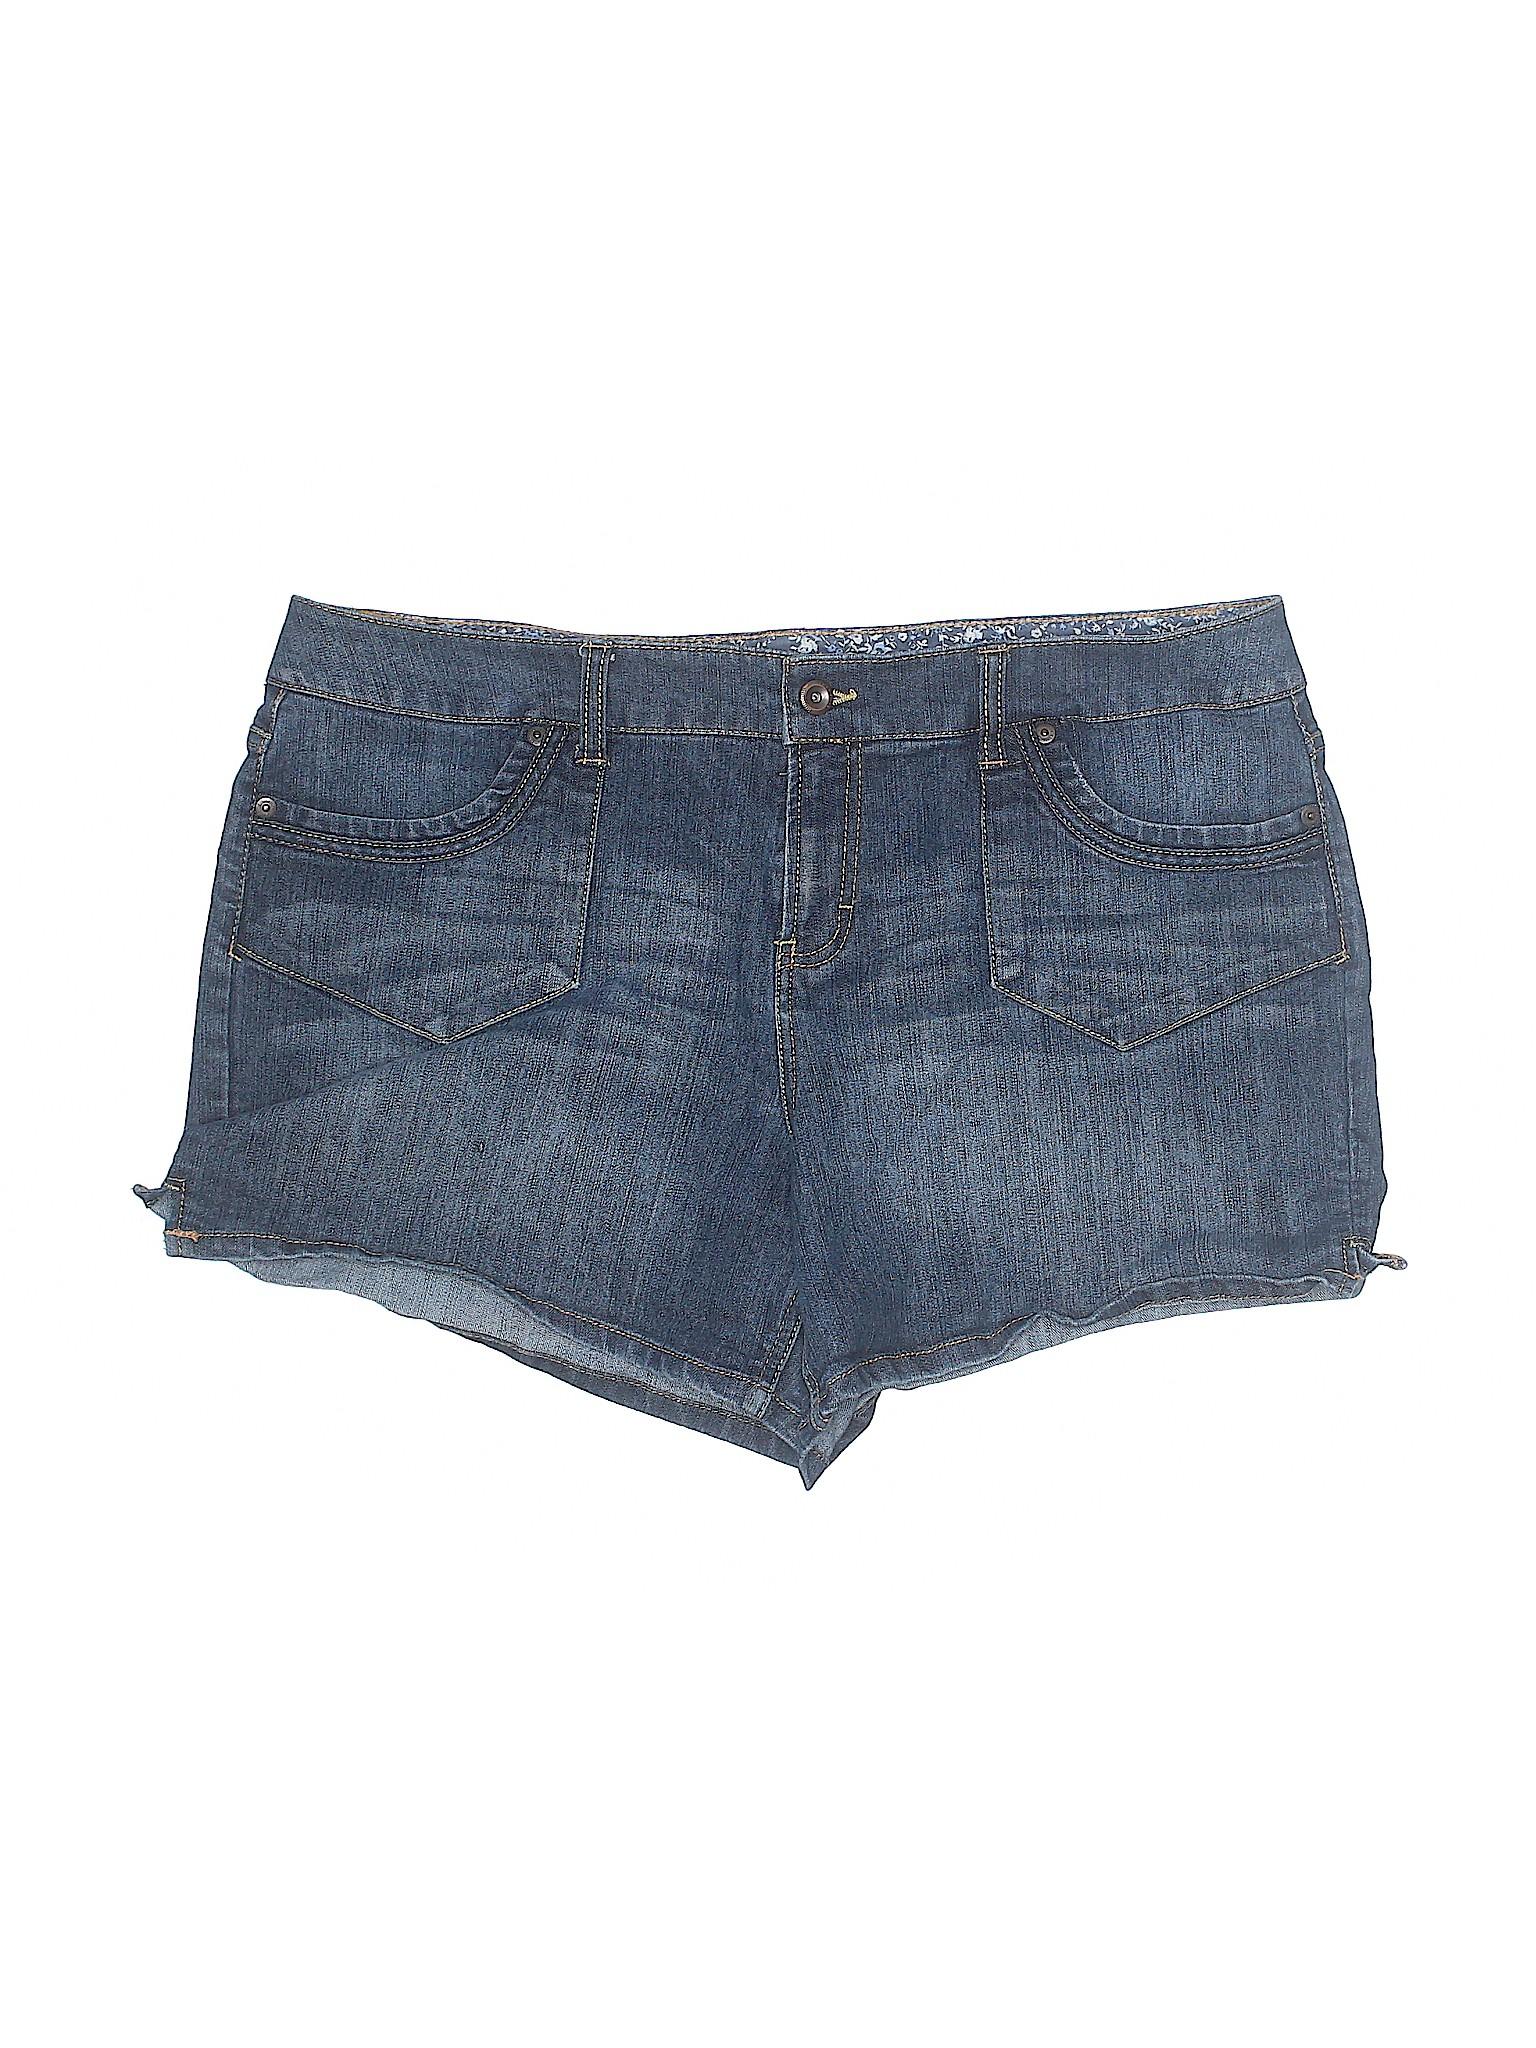 Denim Shorts life Boutique SONOMA style wqYZ8UZ